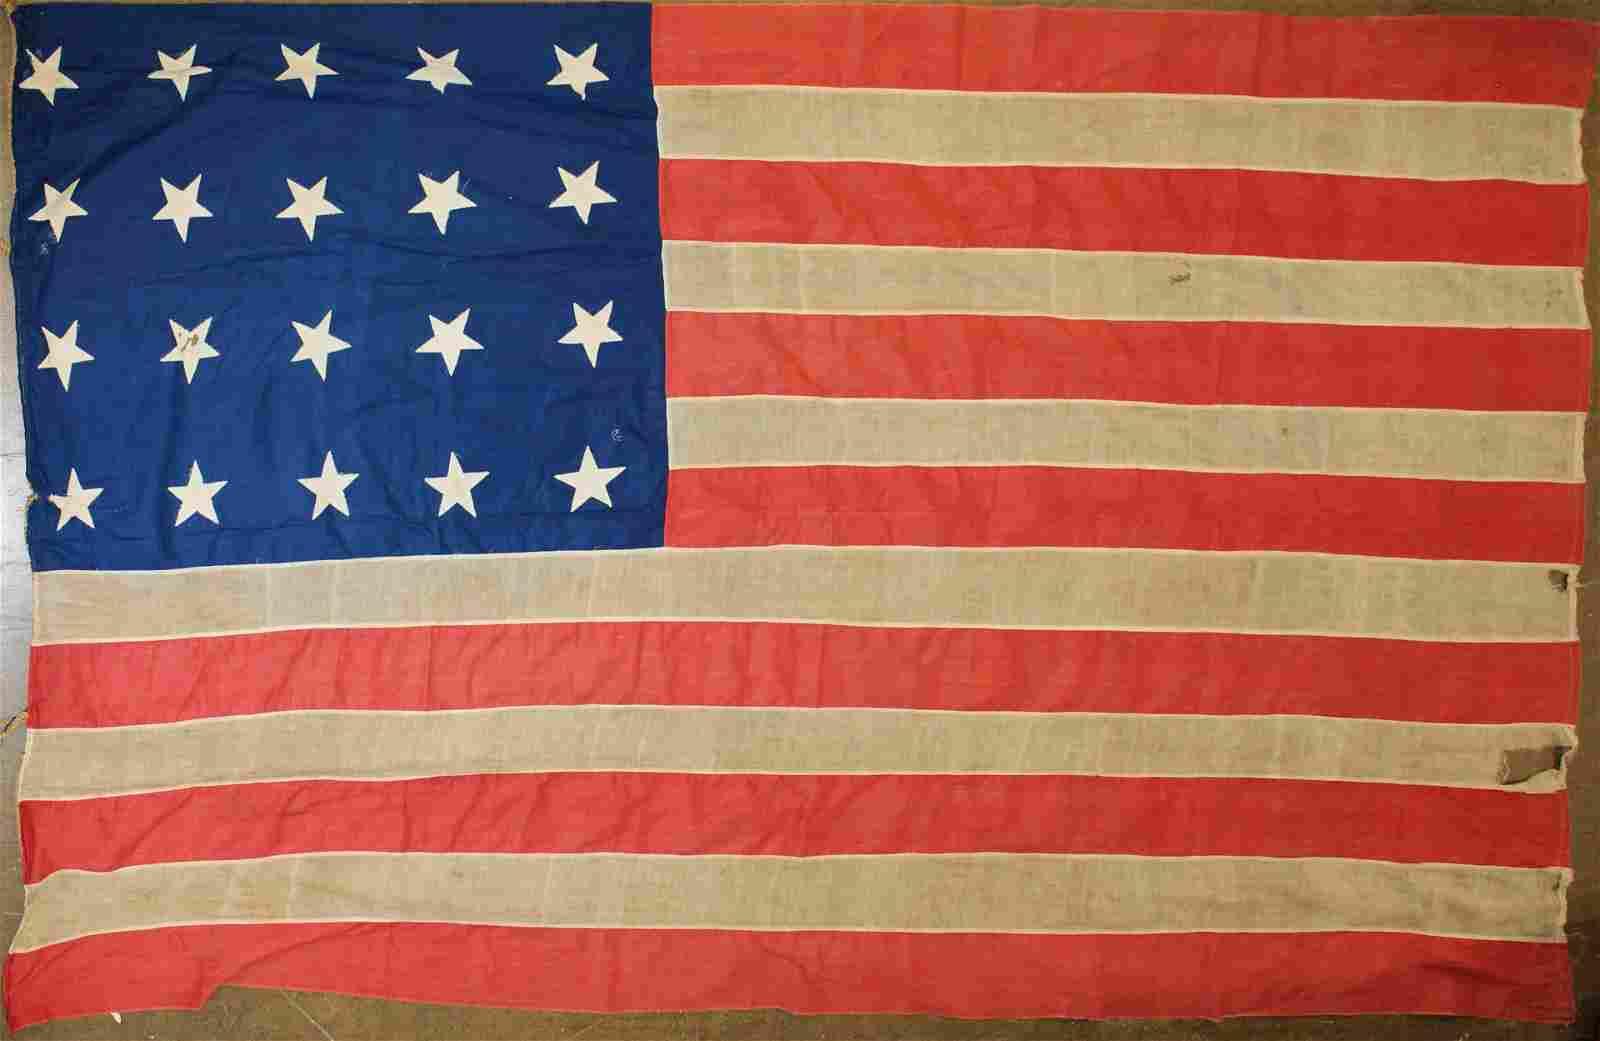 20 star United States flag